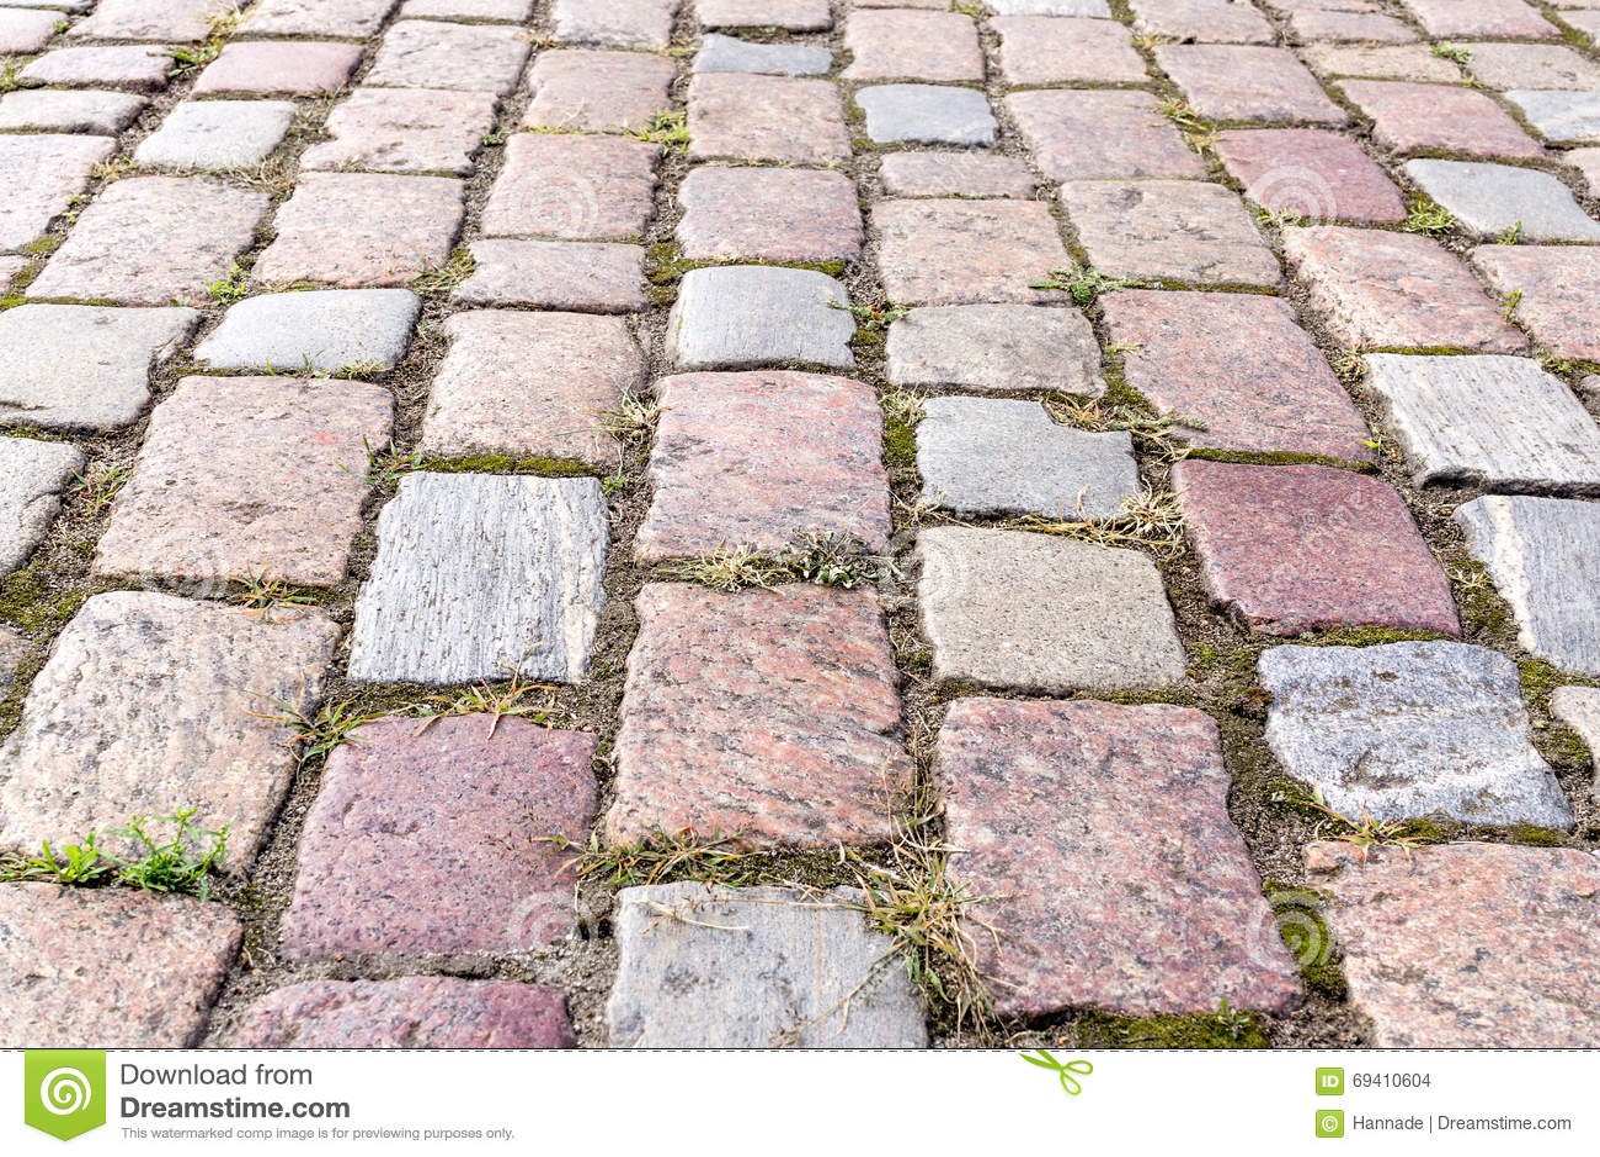 Cobbled block pavement